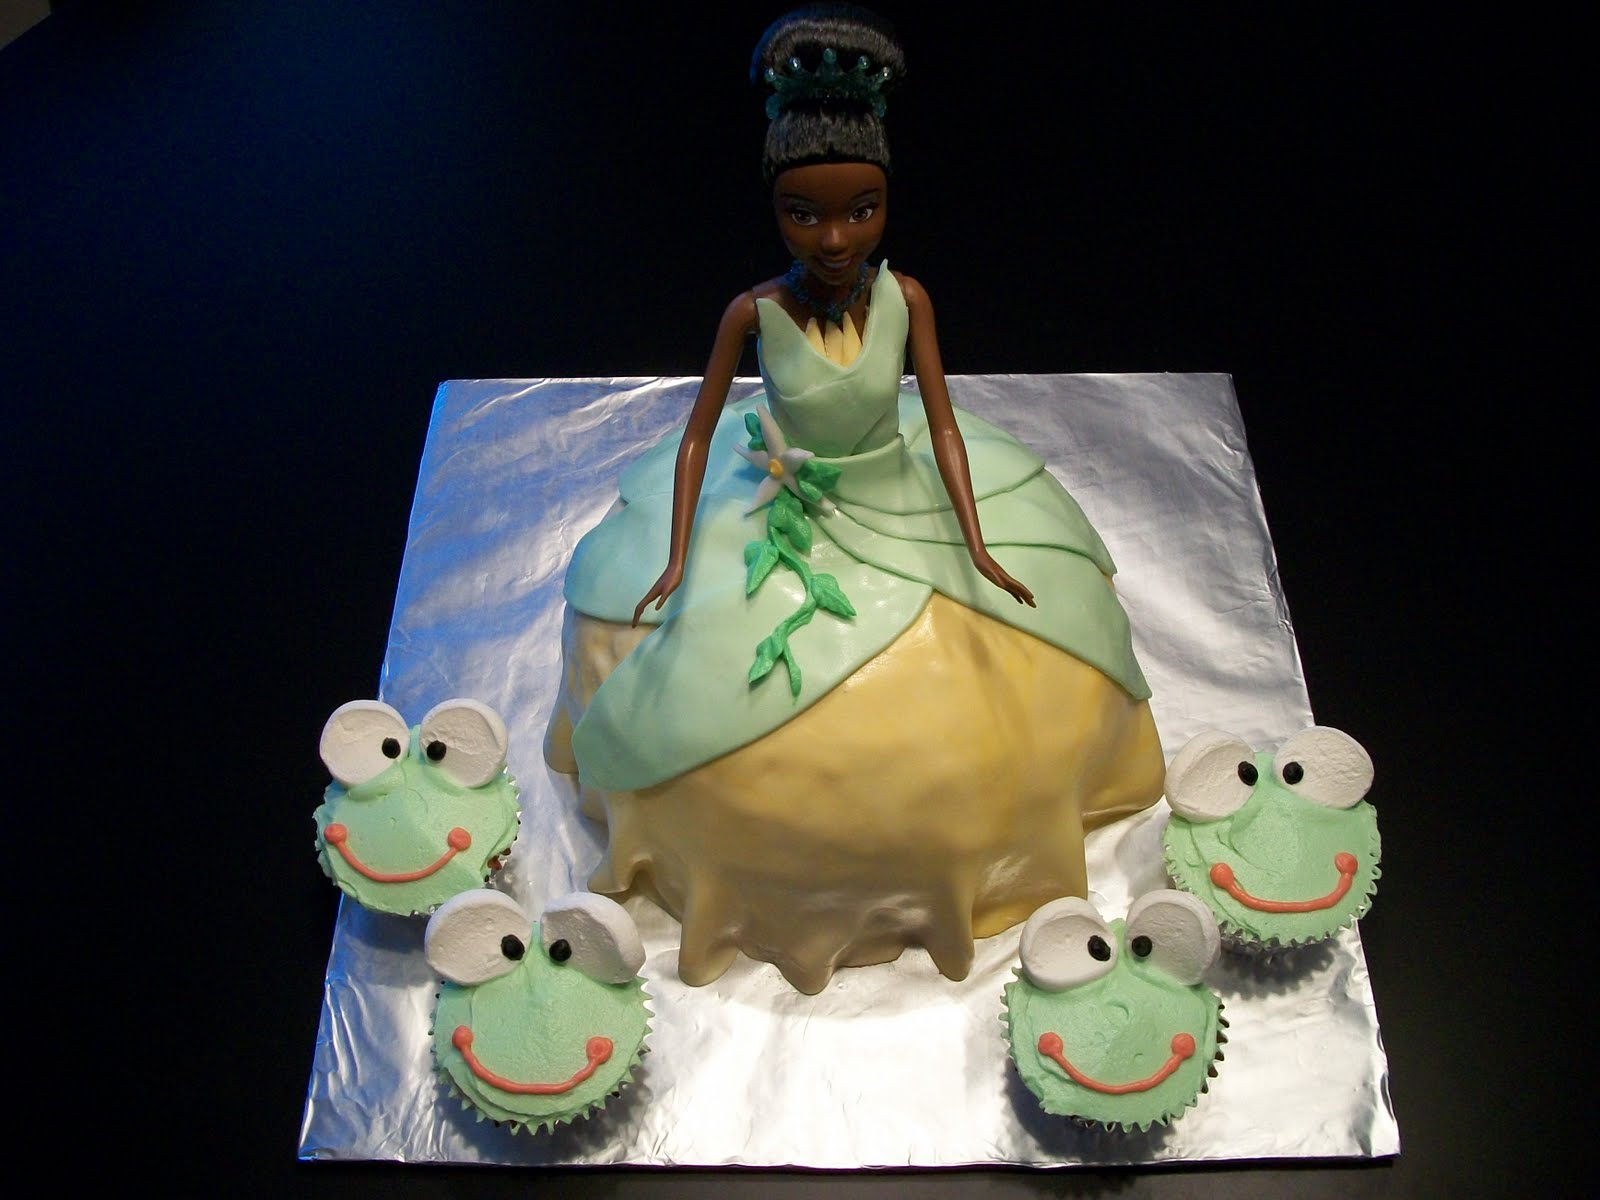 Princess Tiana Cake Images : Princess Tiana Cakes   Decoration Ideas Little Birthday ...